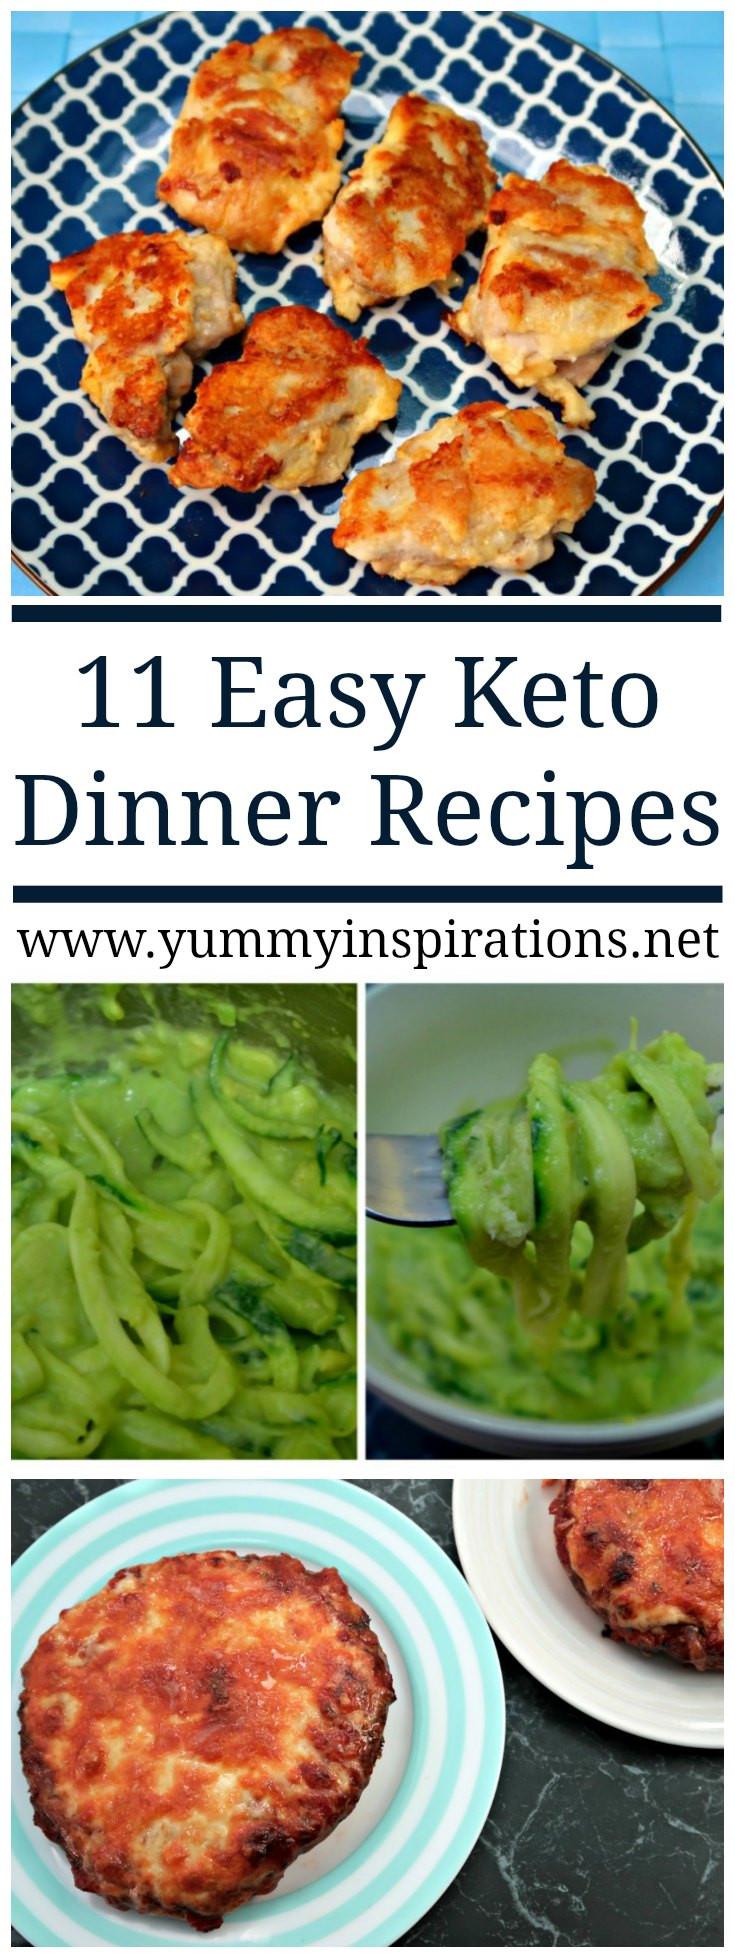 Keto Recipes For Dinner  11 Easy Keto Dinner Recipes Quick Low Carb Ketogenic